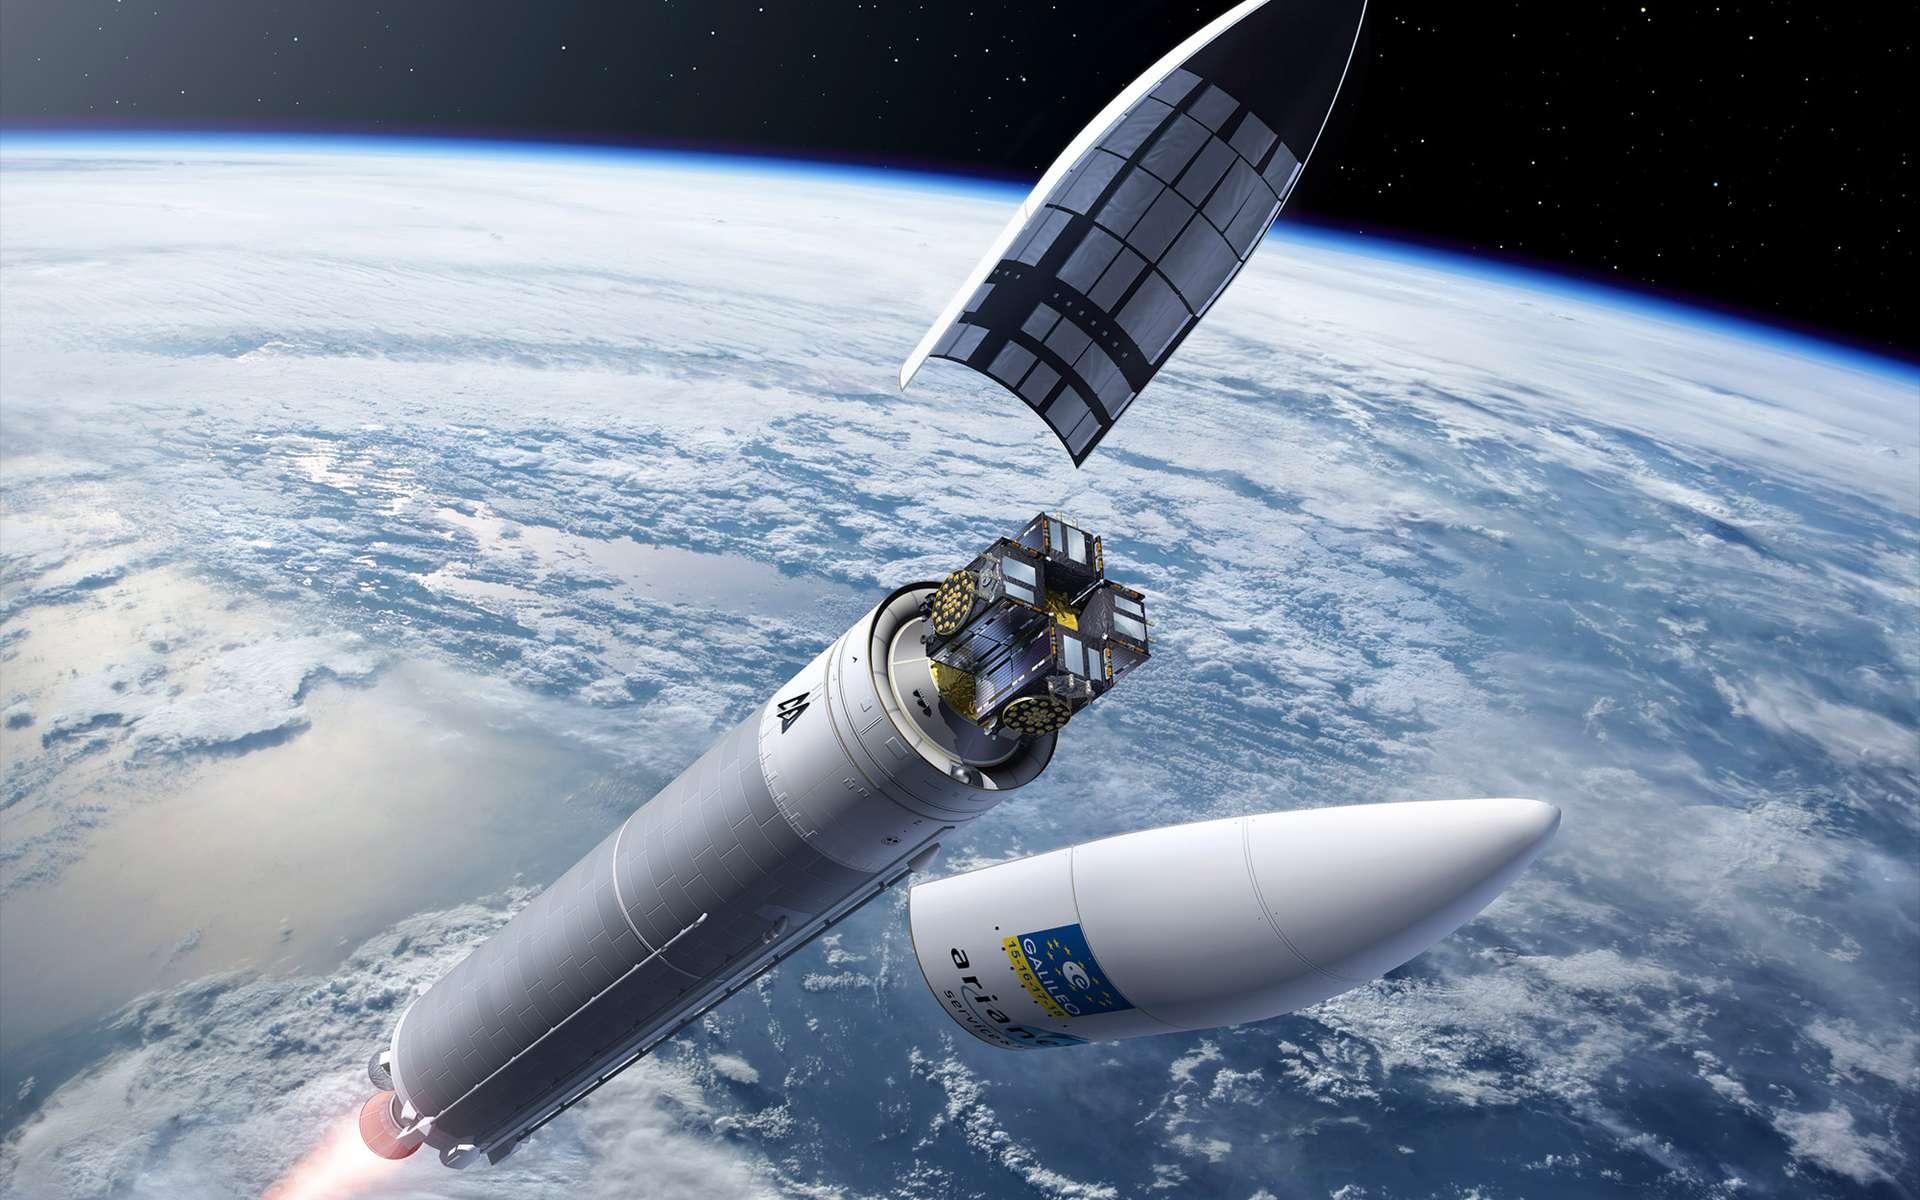 Ariane 5 lancera ses derniers satellites Galileo avant de laisser la place à Ariane 6. © ESA, P. Carril